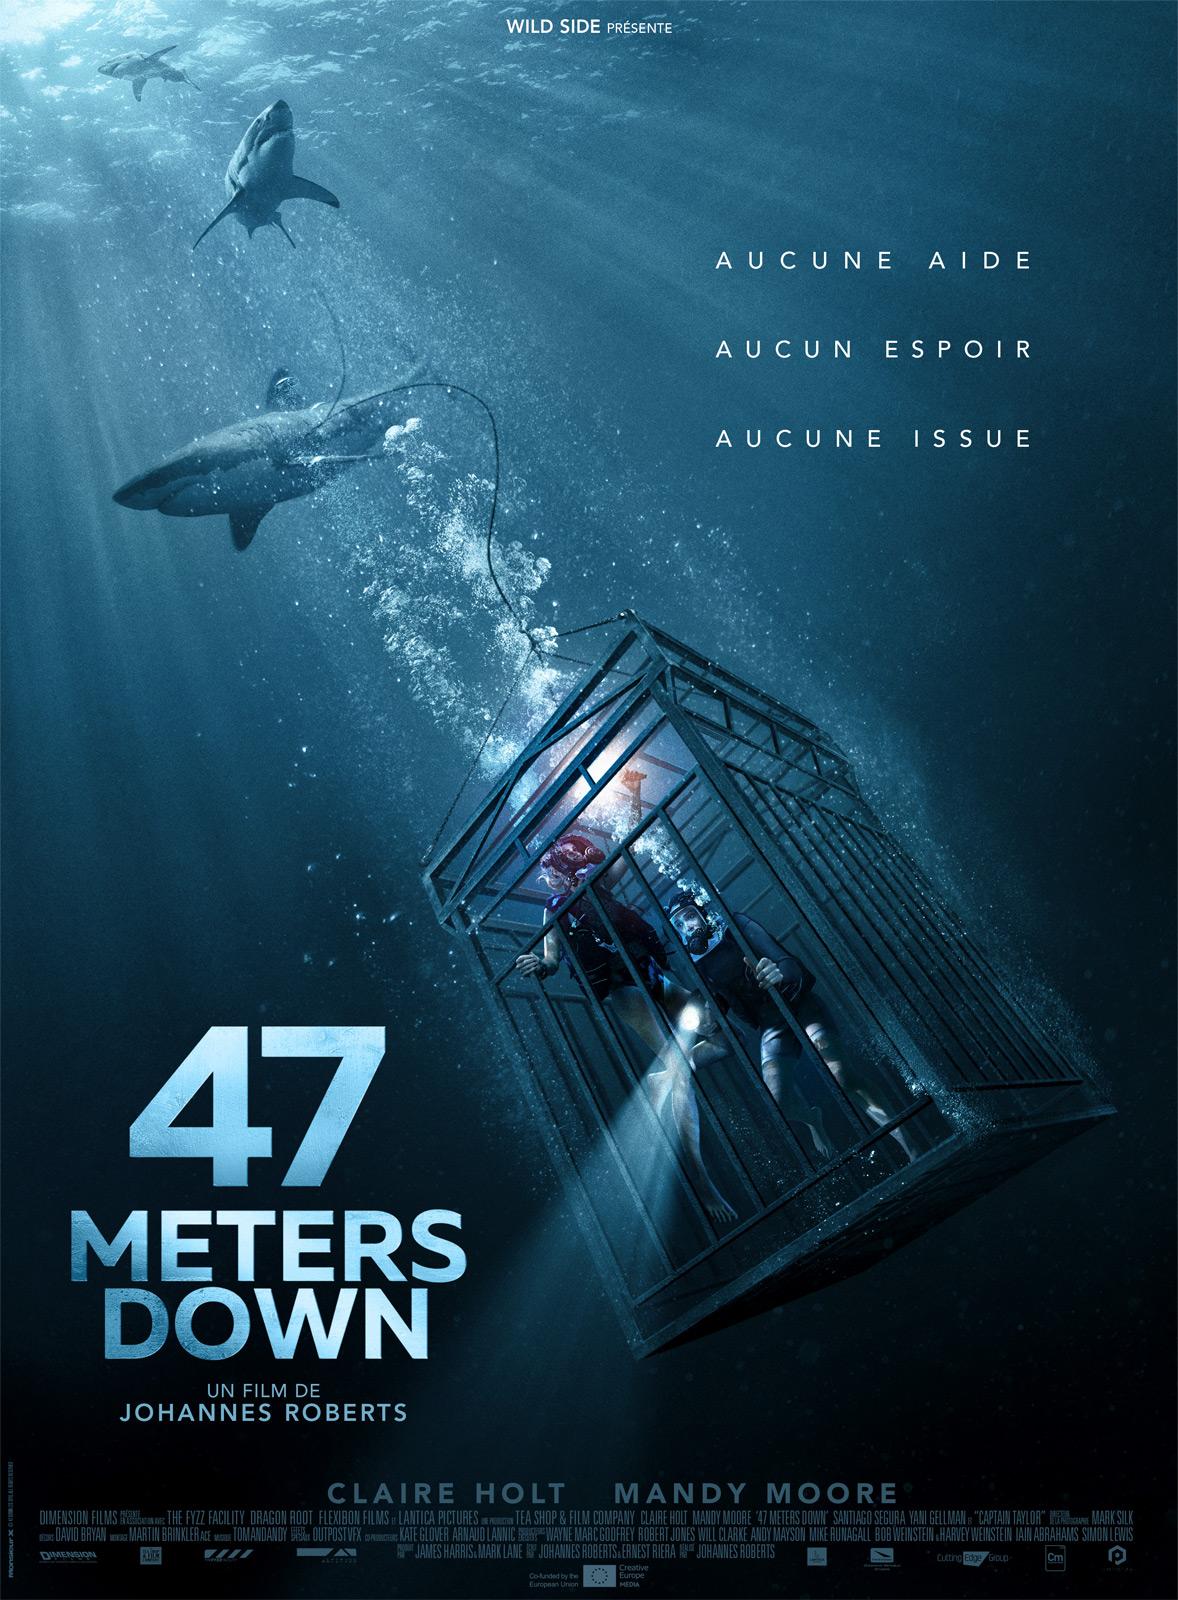 affiche du film 47 Meters Down